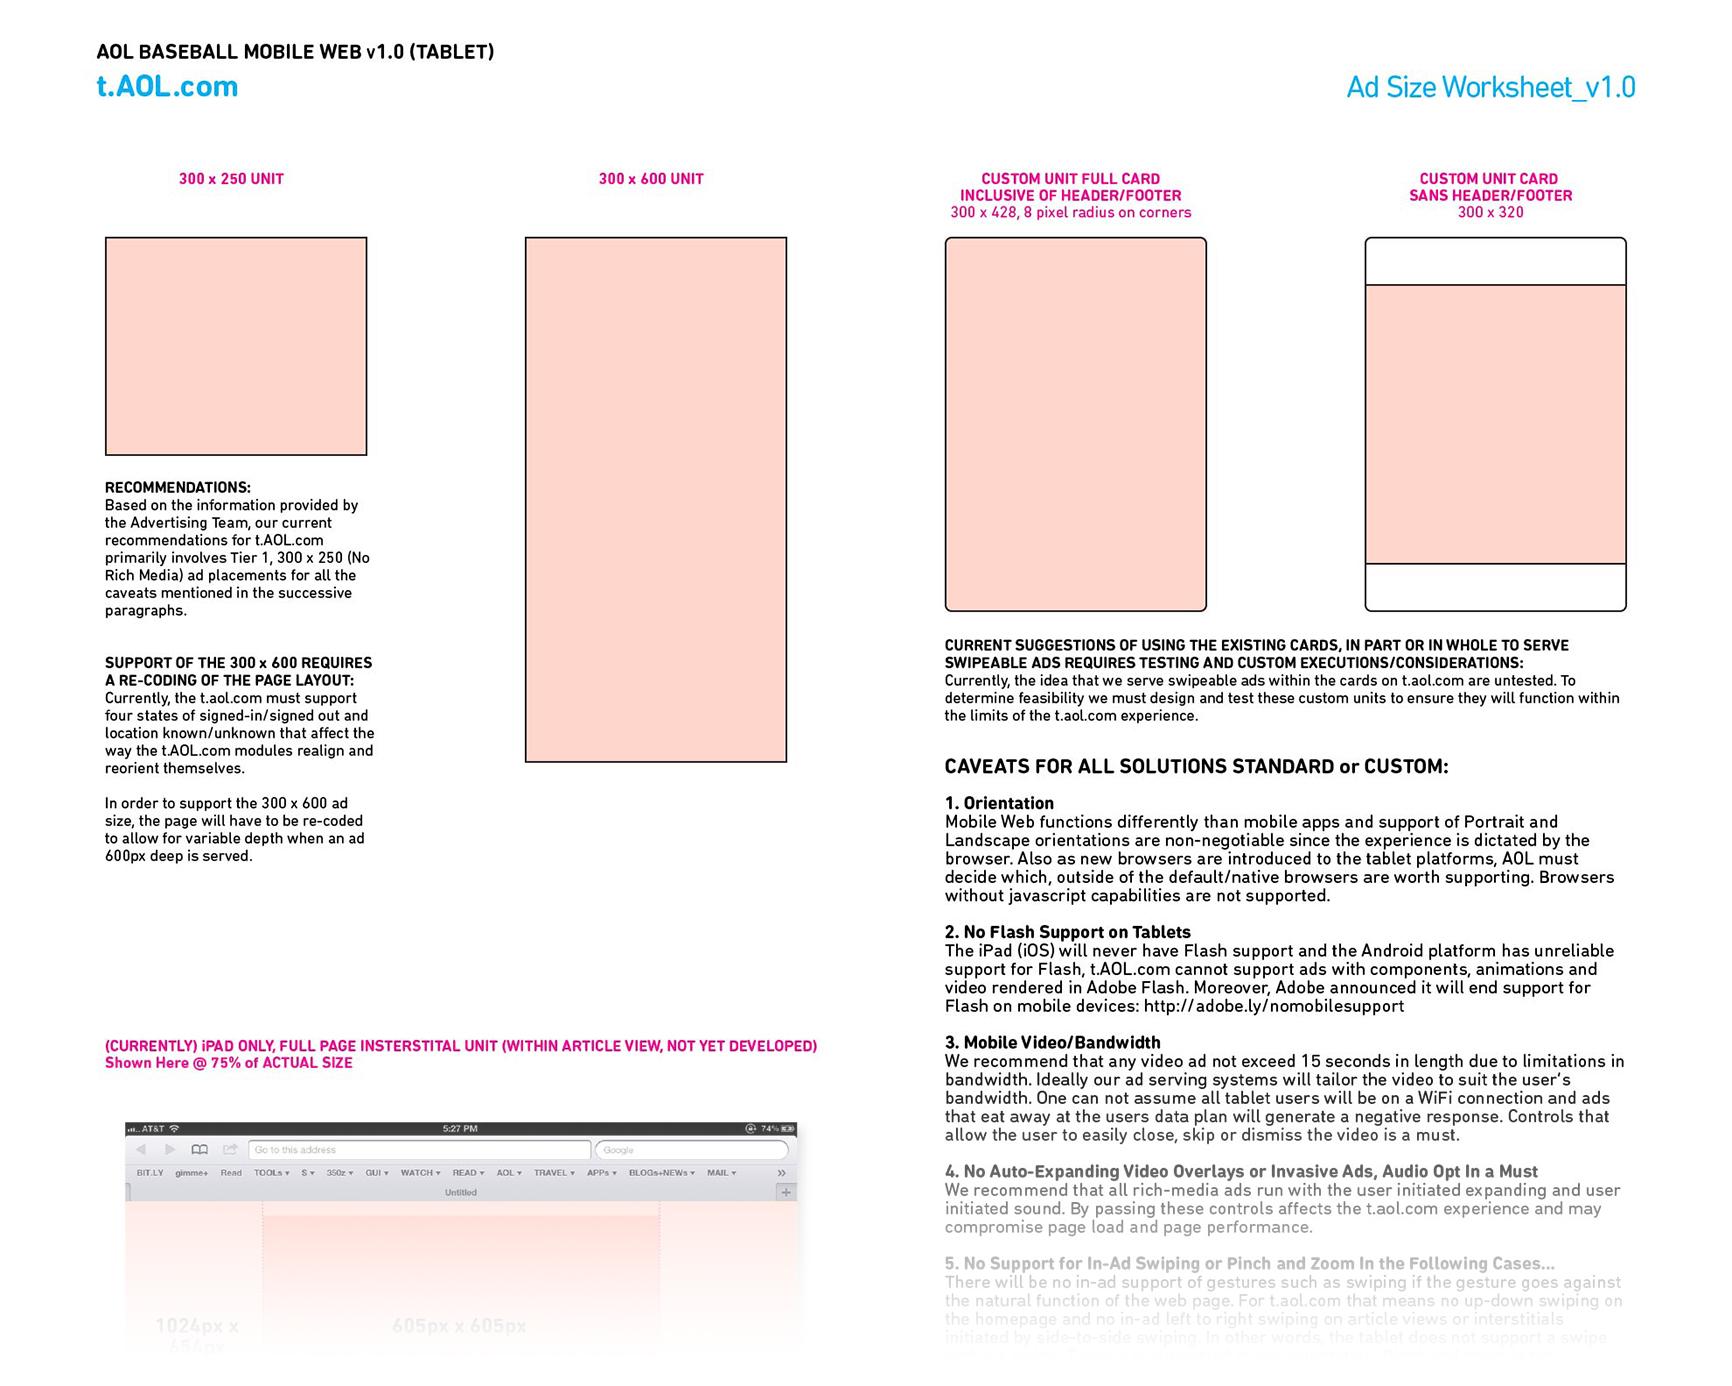 Proj Baseball Anatomy of a Card 03_Ads-Crop.jpg